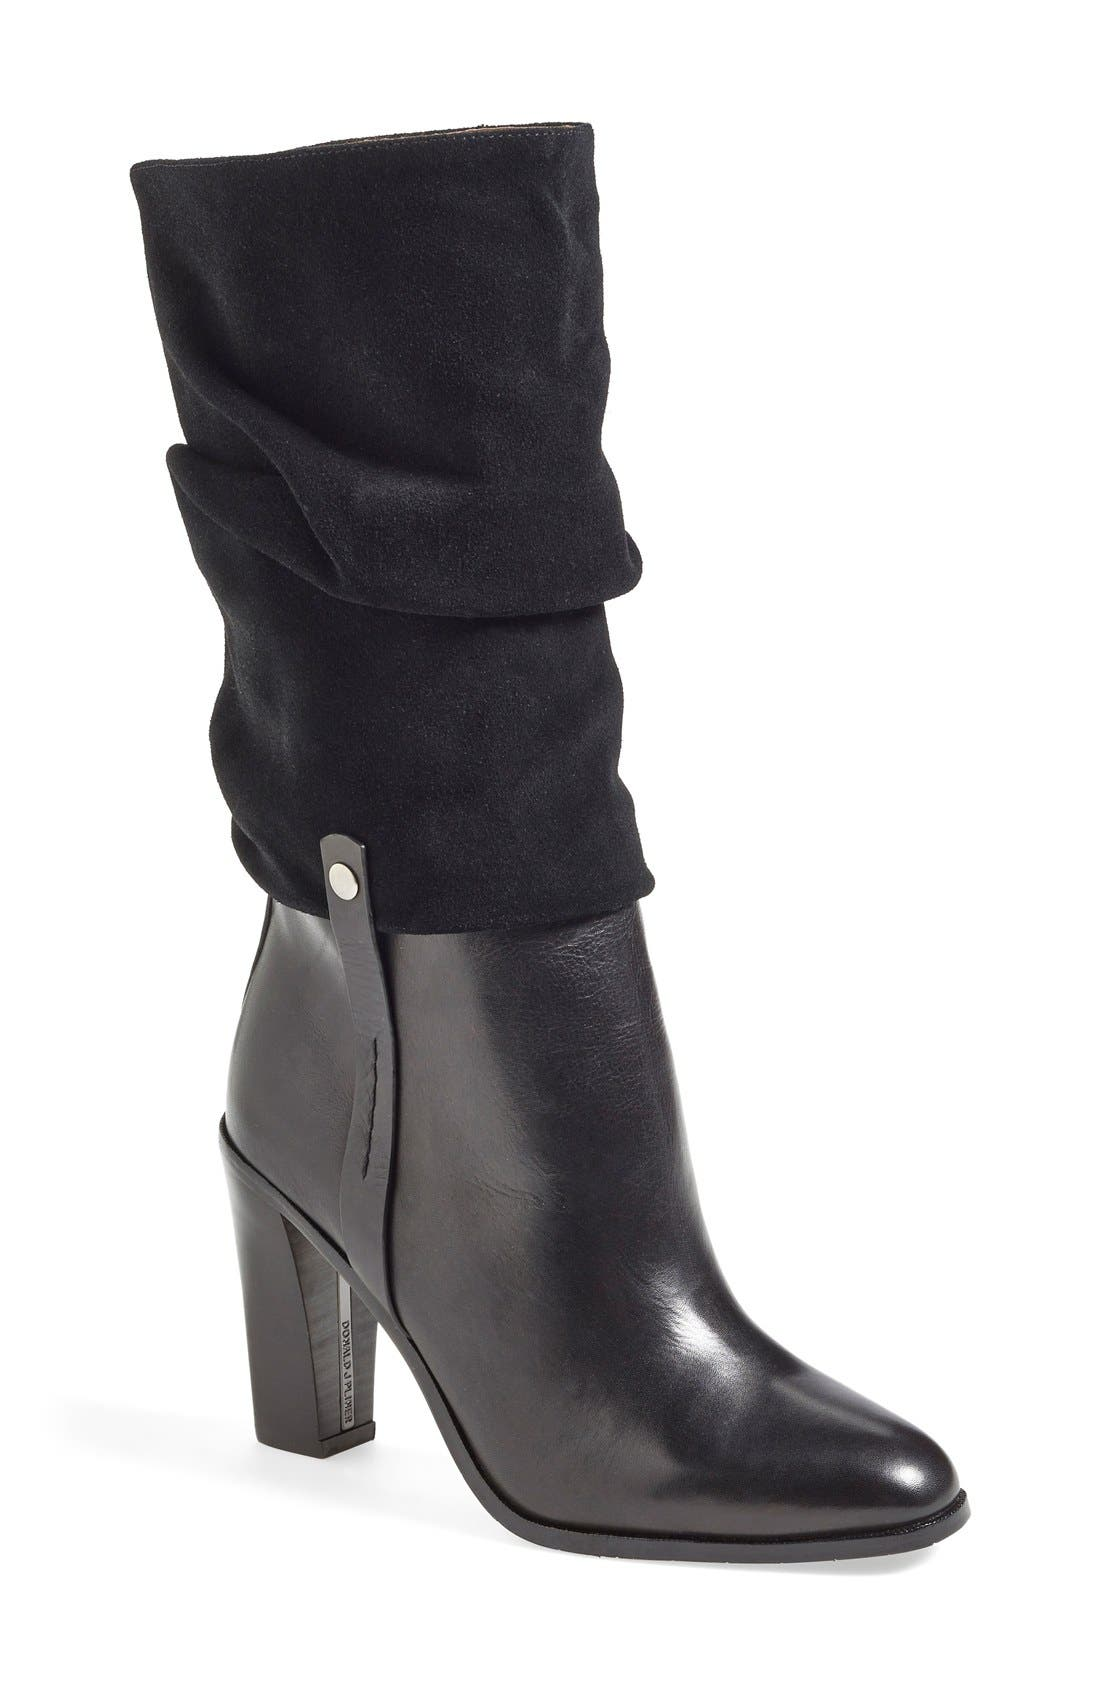 Alternate Image 1 Selected - Donald J Pliner 'Odessa' Slouched Shaft Boot (Women) (Online Only)